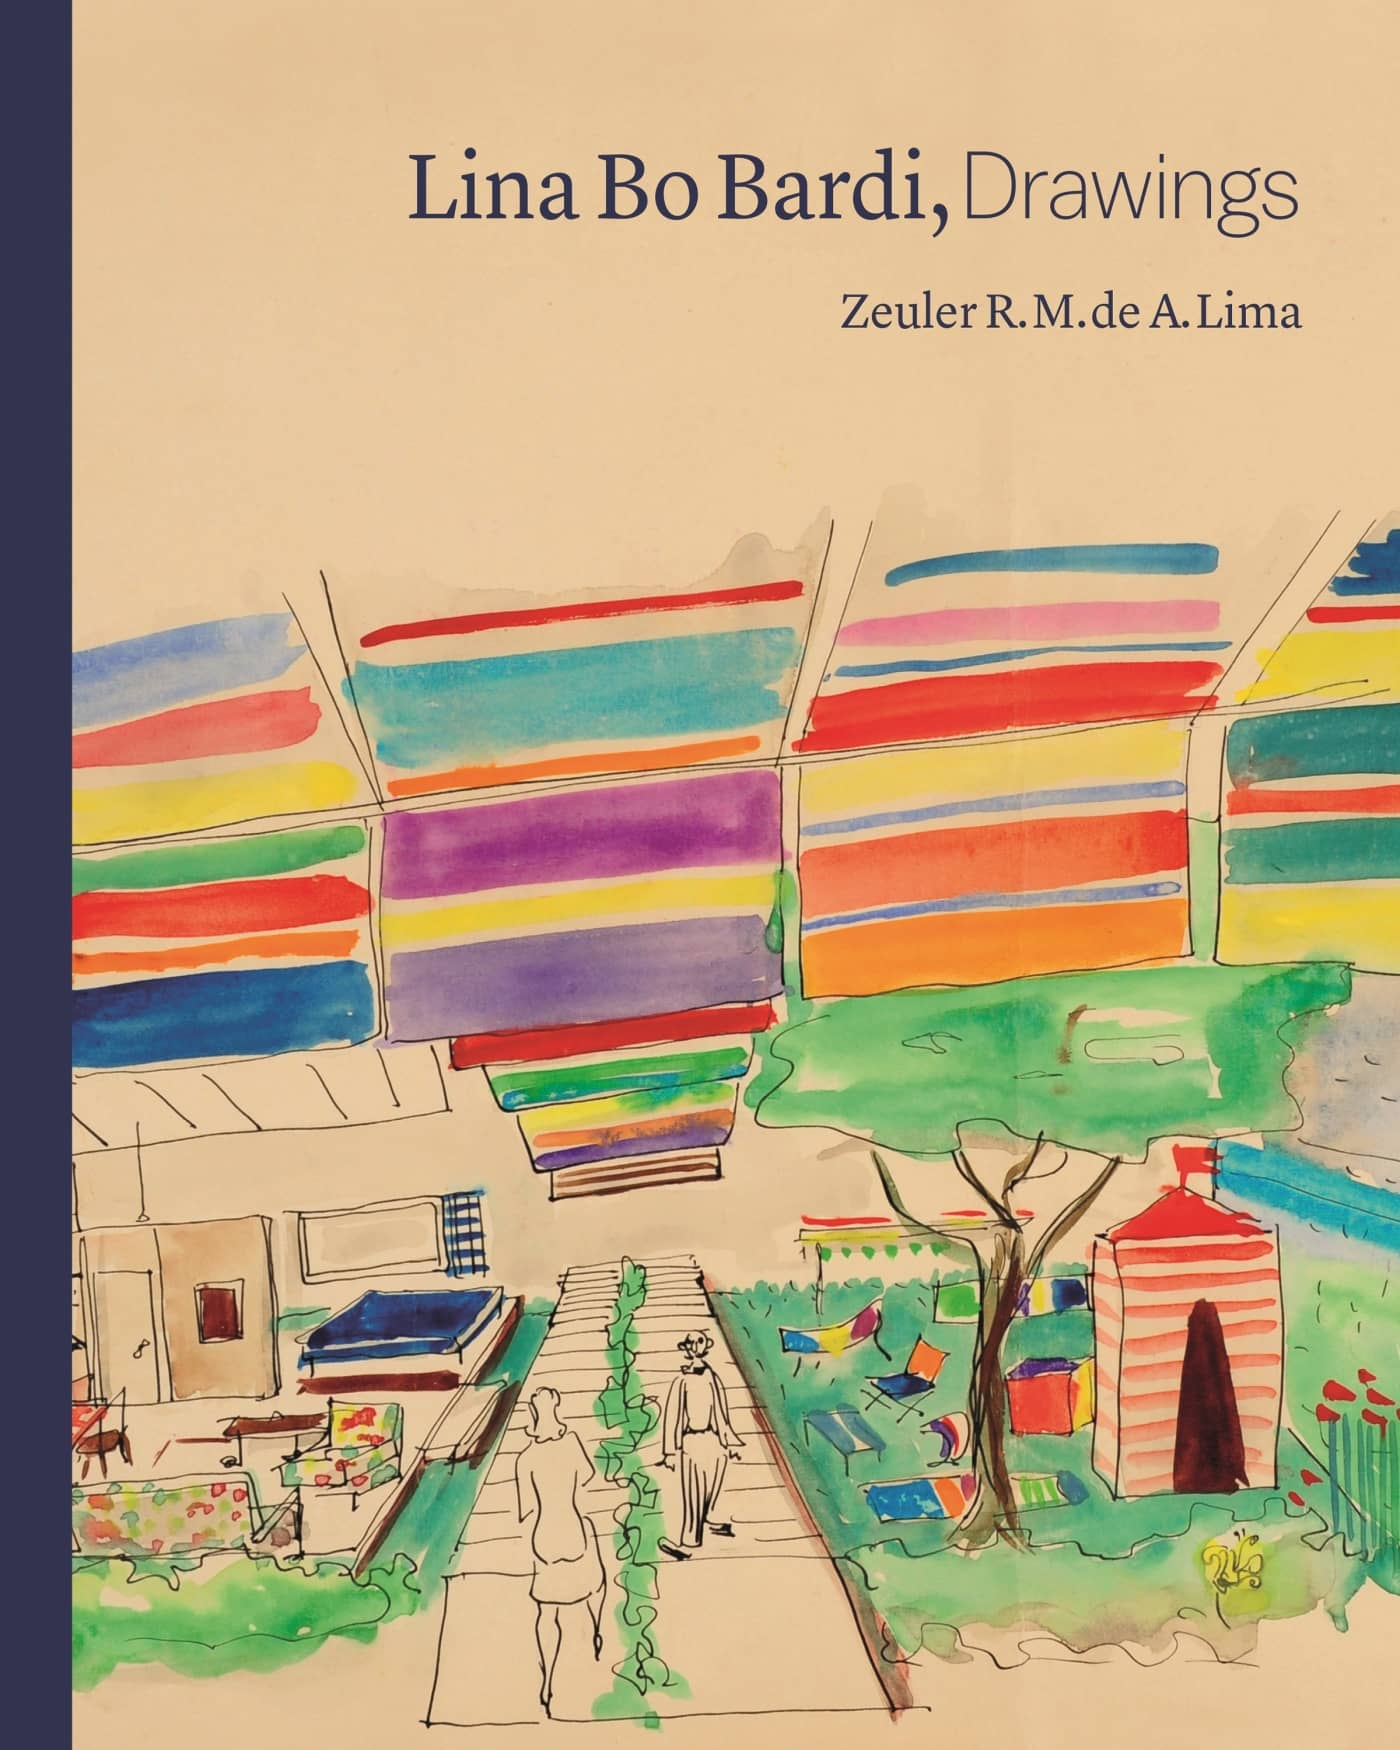 'Lina Bo Bardi, Drawings' book cover